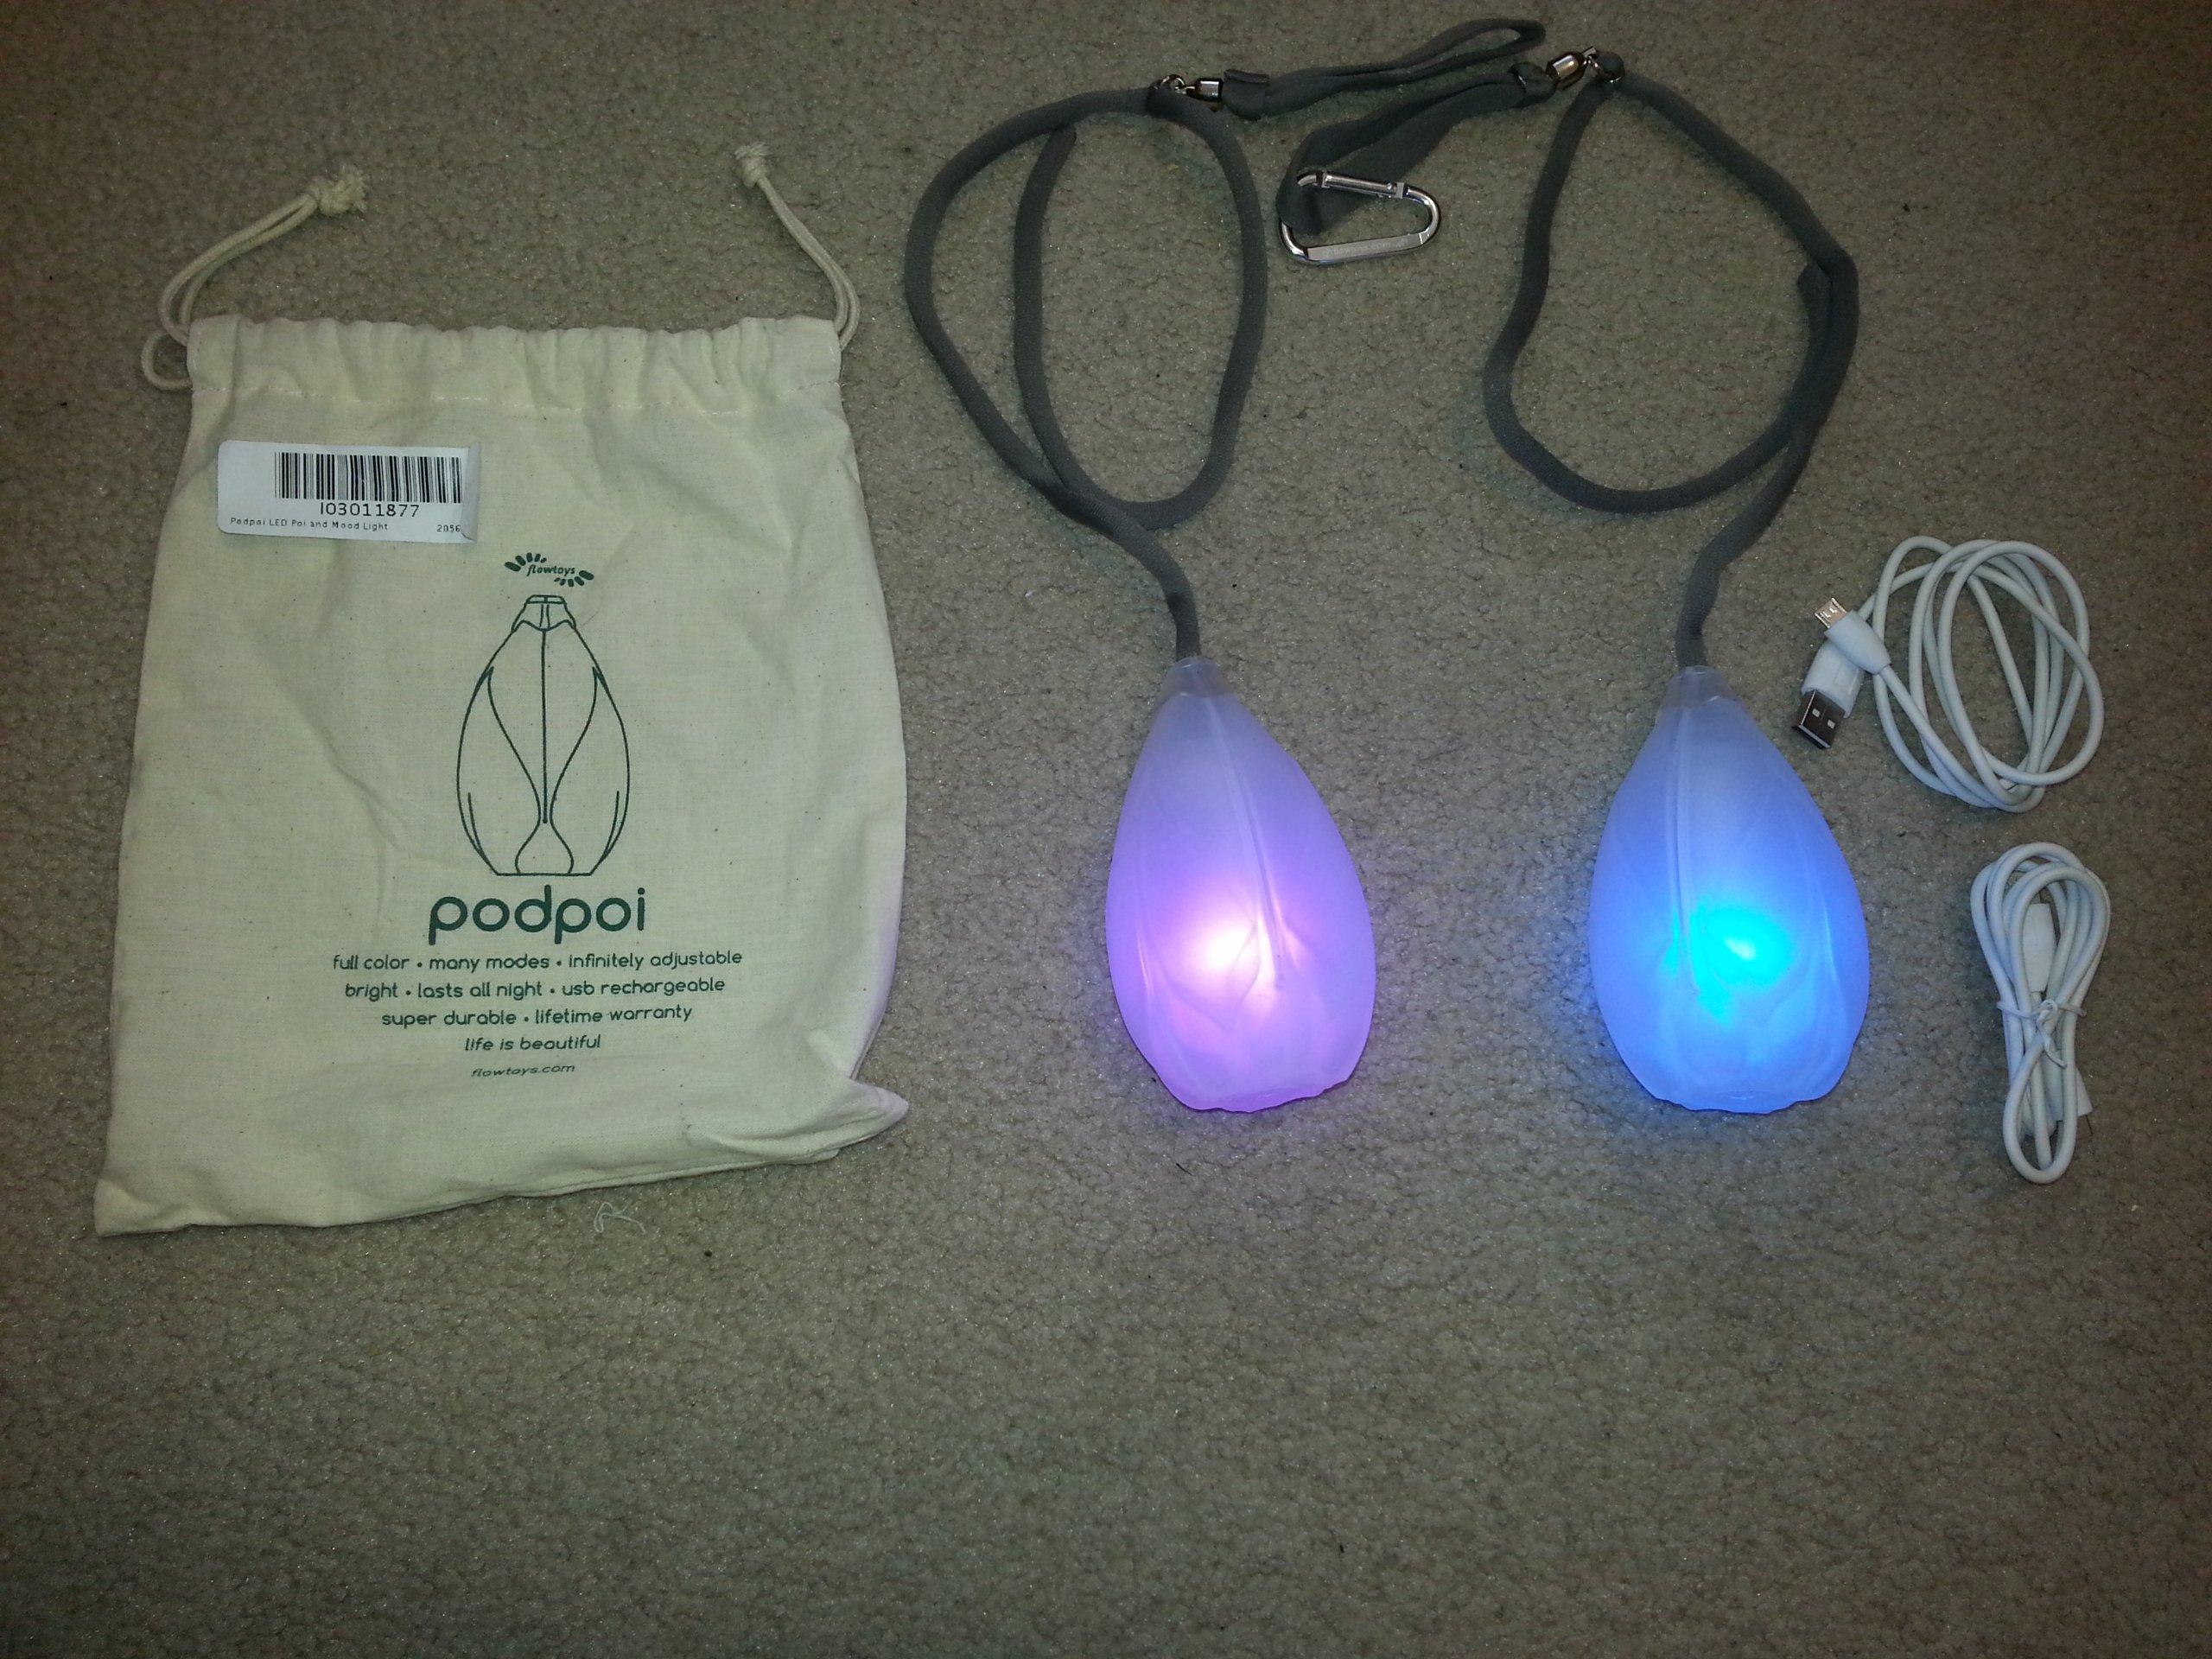 Podpoi LED Poi and Mood Light